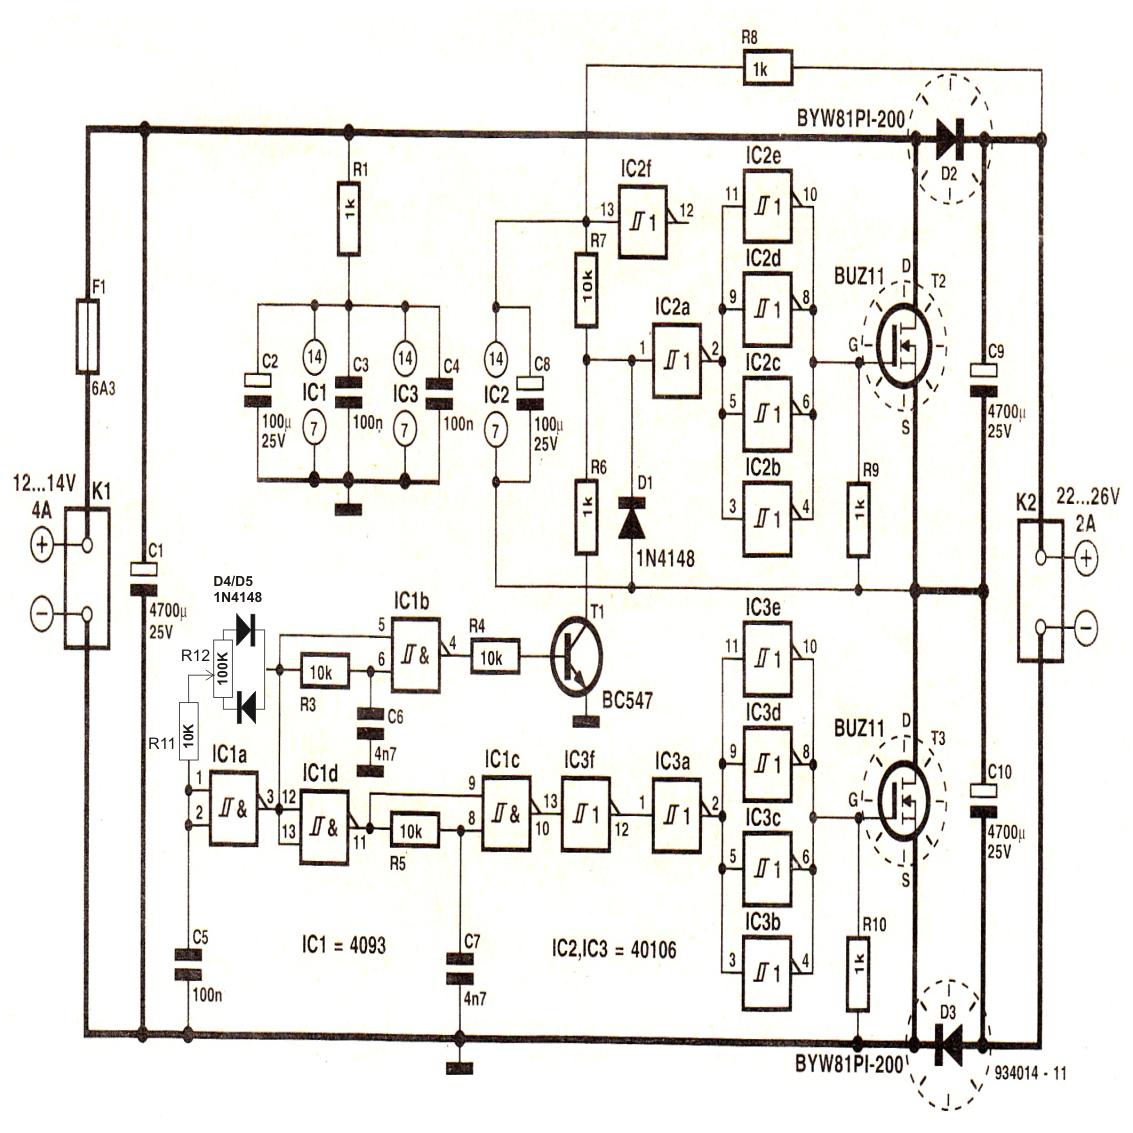 laptop power supply for car circuit schematic electronics schema laptop power supply for car circuit schematic [ 1133 x 1133 Pixel ]